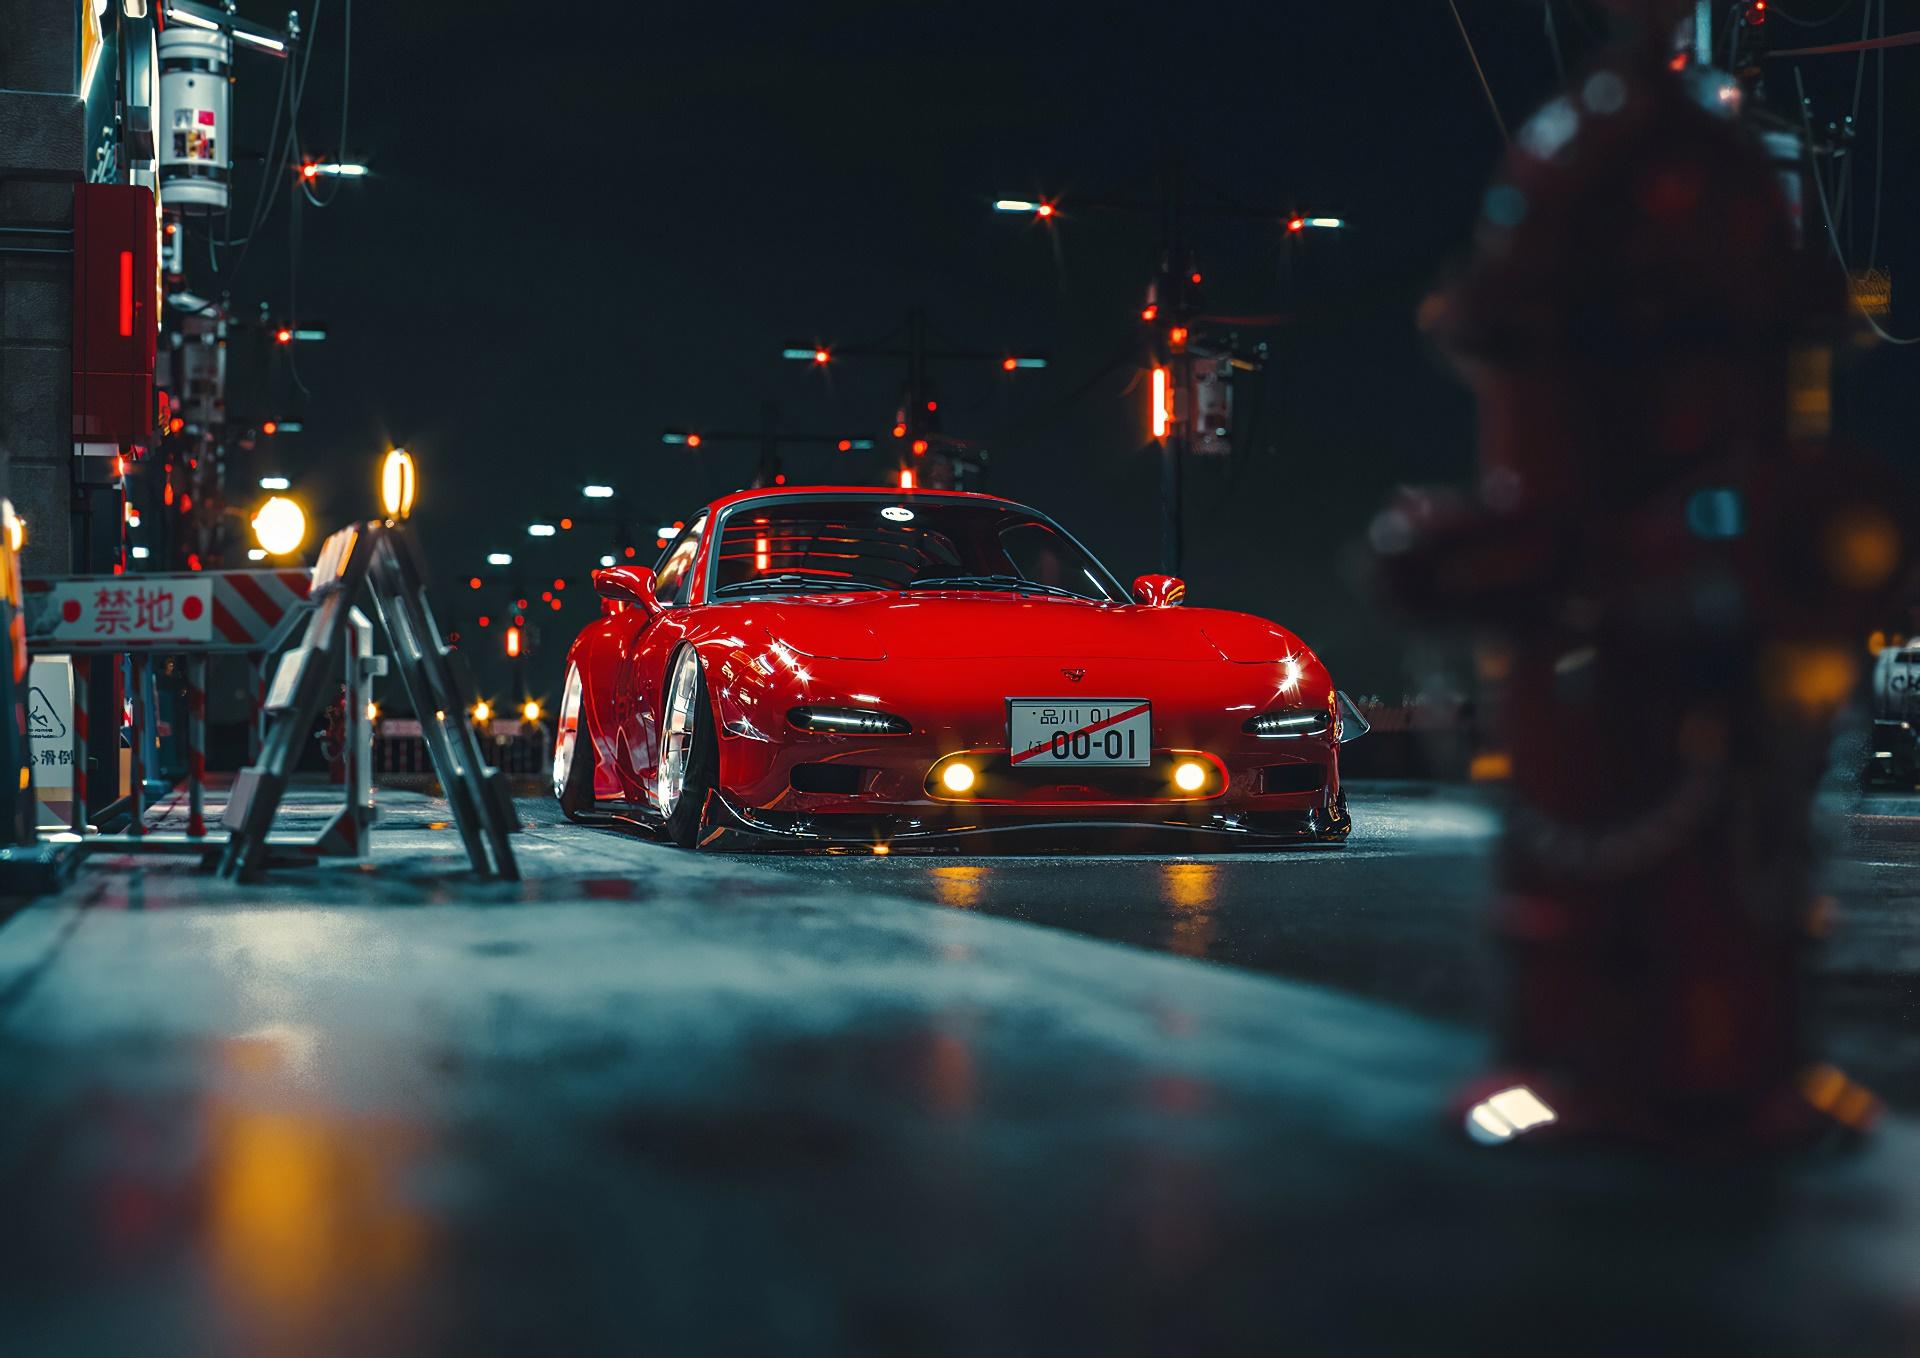 Wallpaper : Mazda RX 7, car, night, vehicle, red cars ...